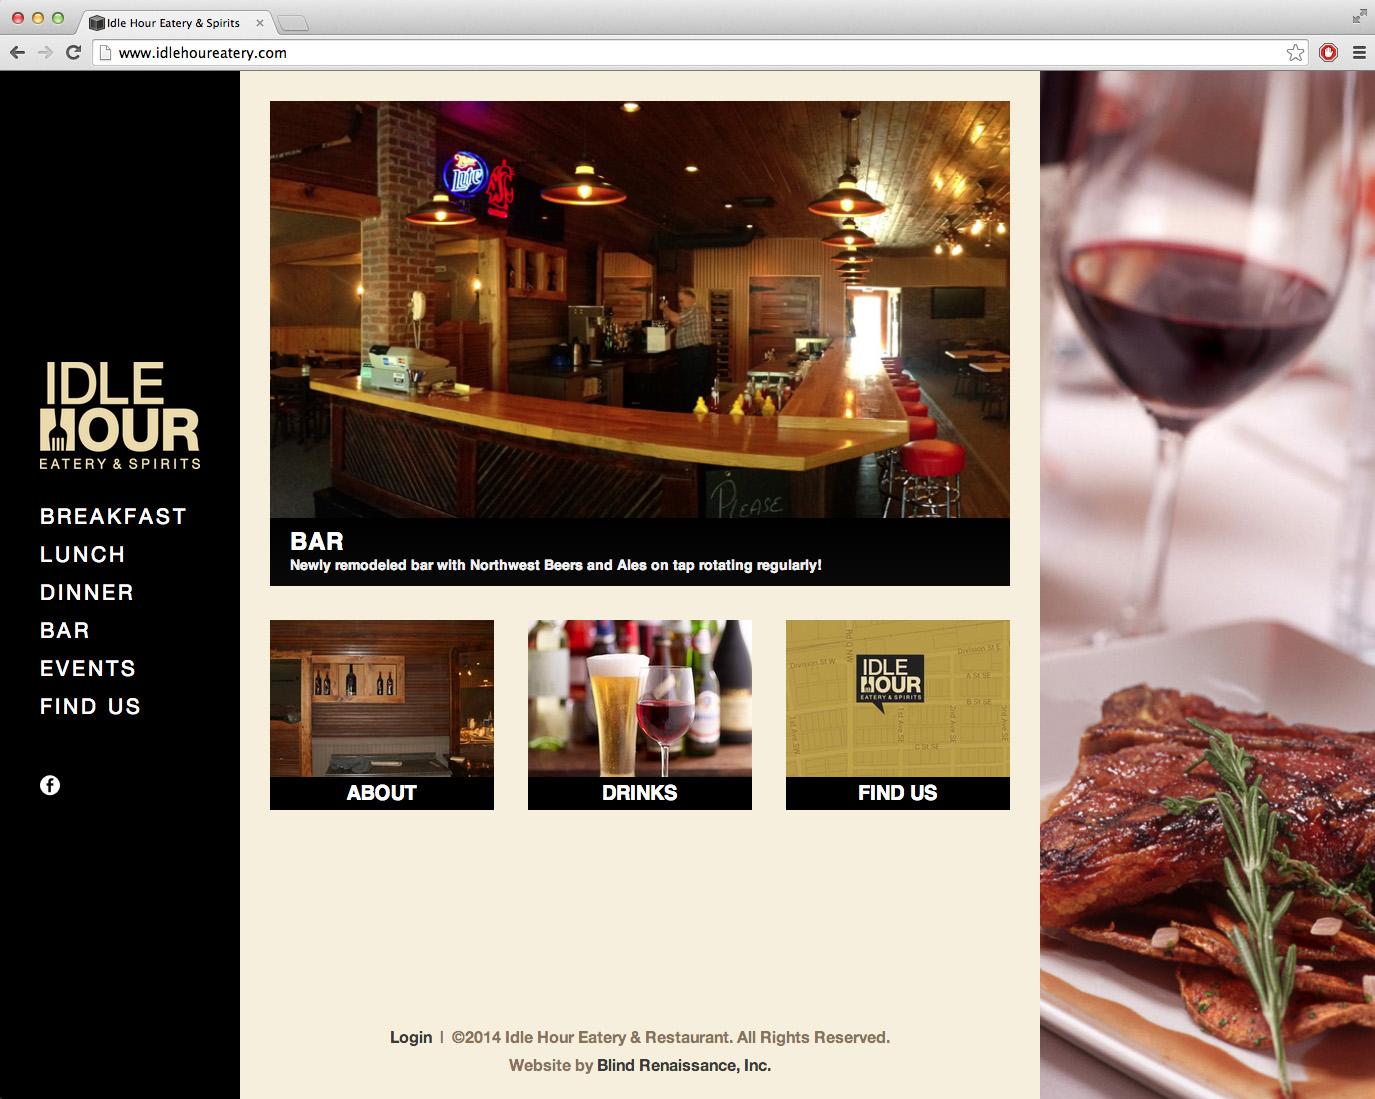 Homepage of www.idlehoureatery.com